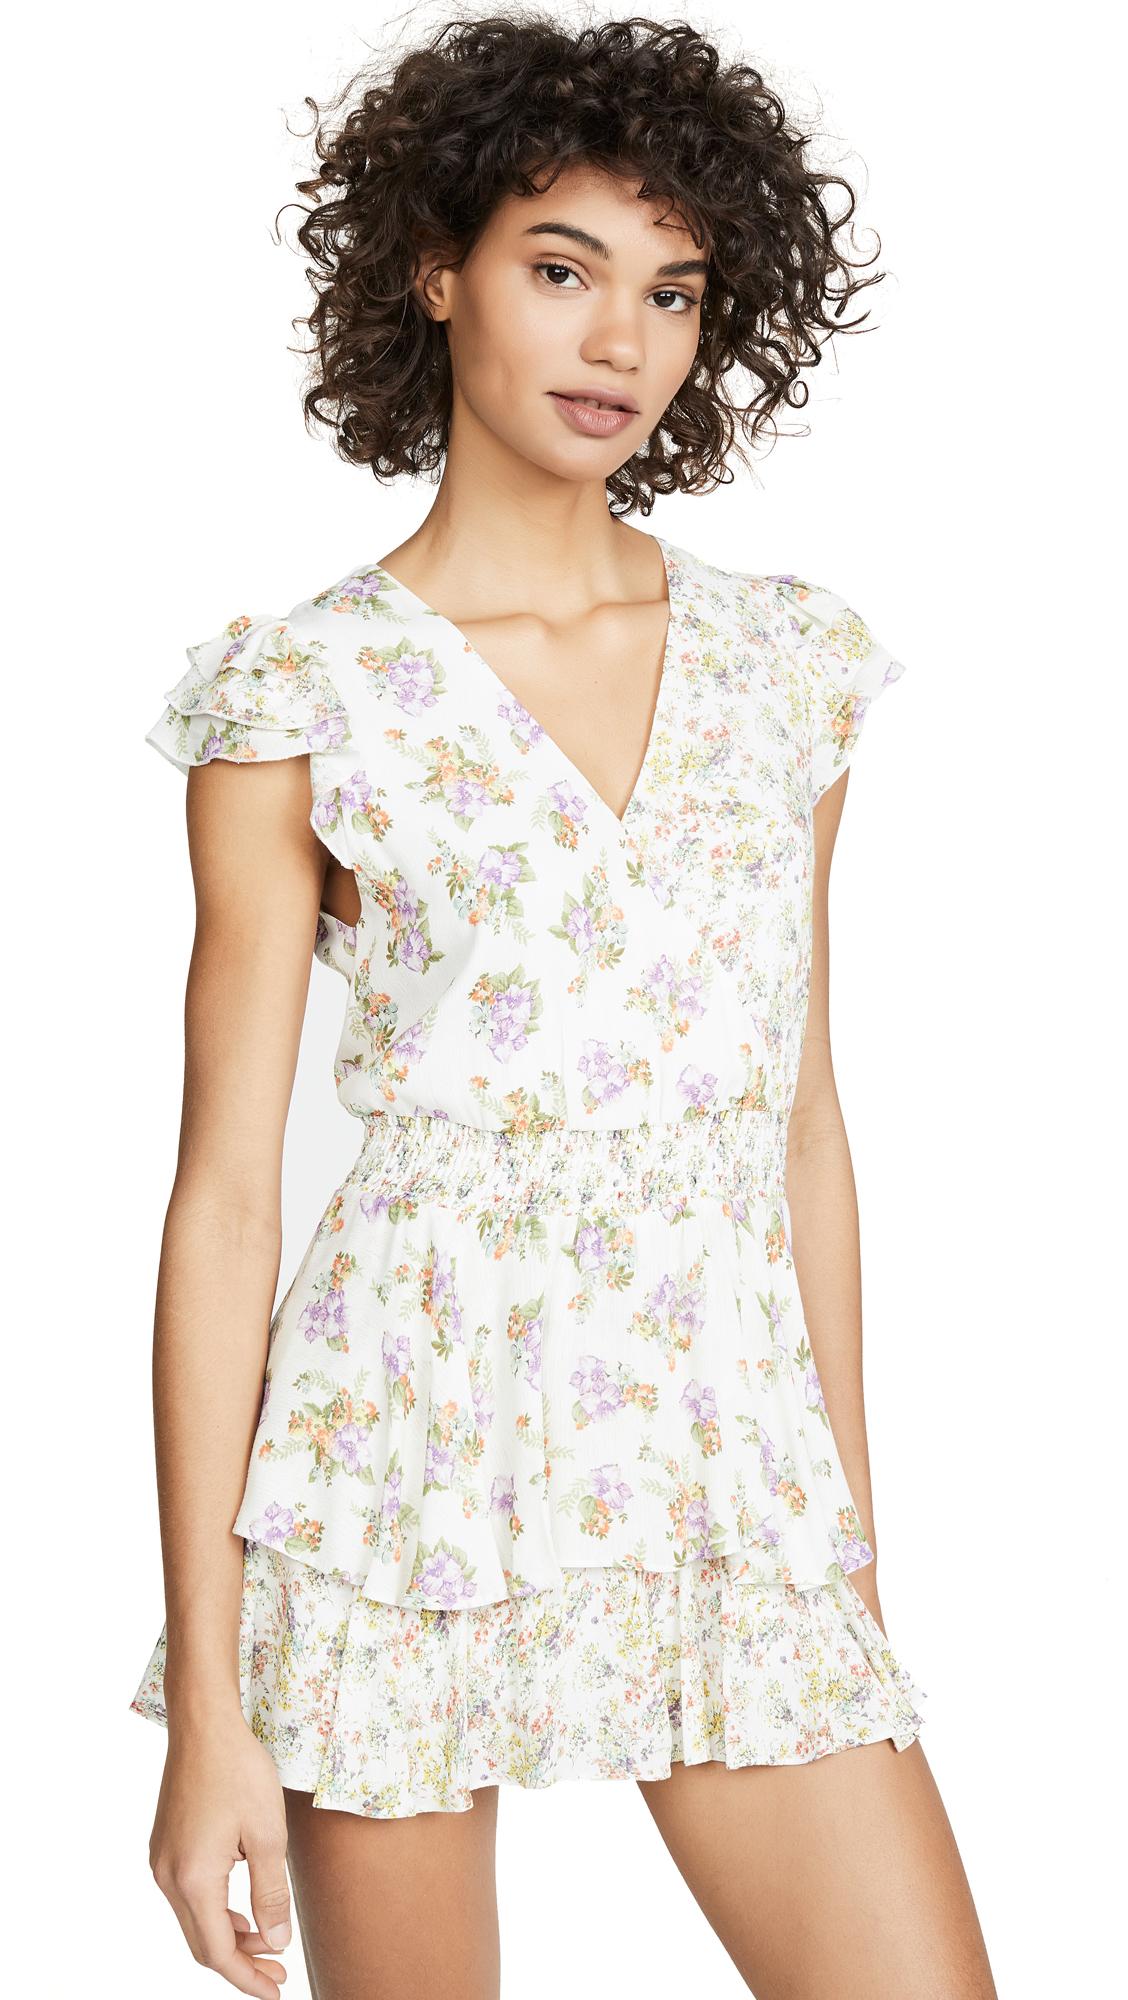 alice + olivia Mariska Ruffled Skort Romper - Hibiscus Flower Cream/Multi